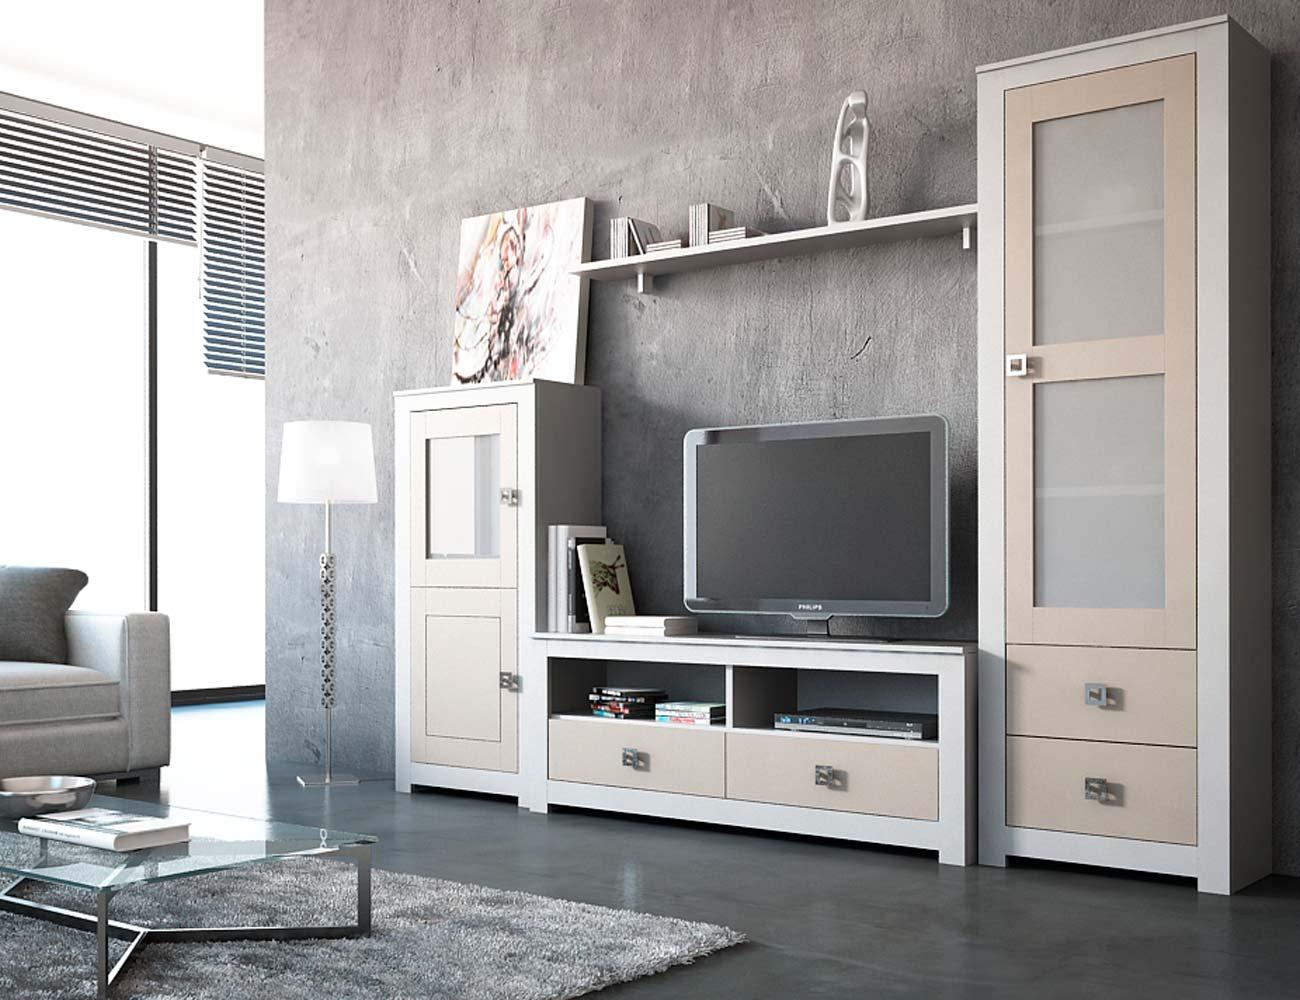 2 mueble salon modular lacado blanco piedra madera dm1